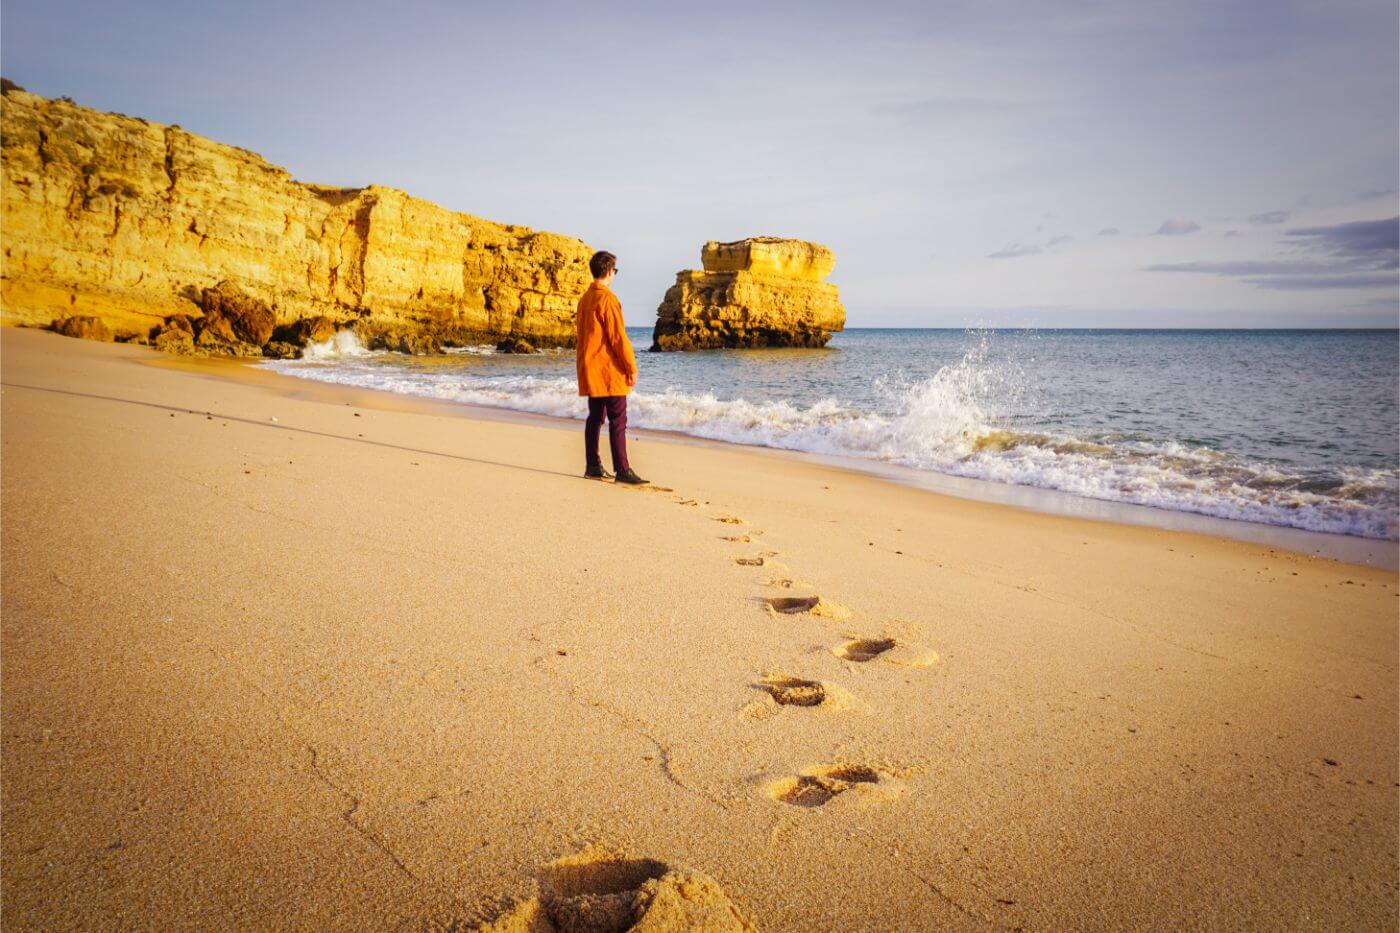 Praia de São Rafael - 7 days in Algarve, Portugal - road trip